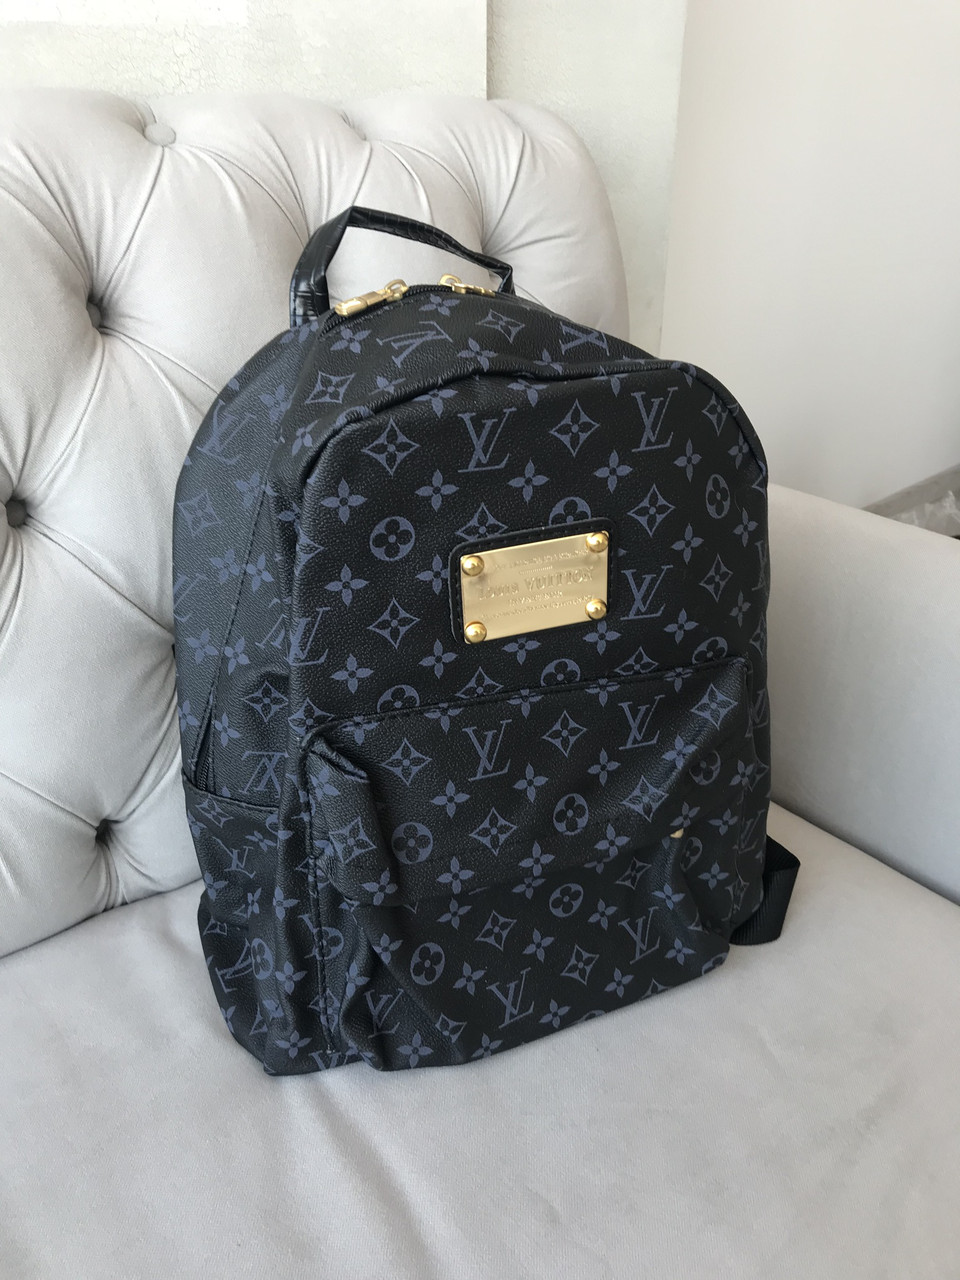 a27ba0e3d9a4 Городской Рюкзак LV Louis Vuitton (реплика Луи Витон) Vintage Black -  Планета здоровья интернет